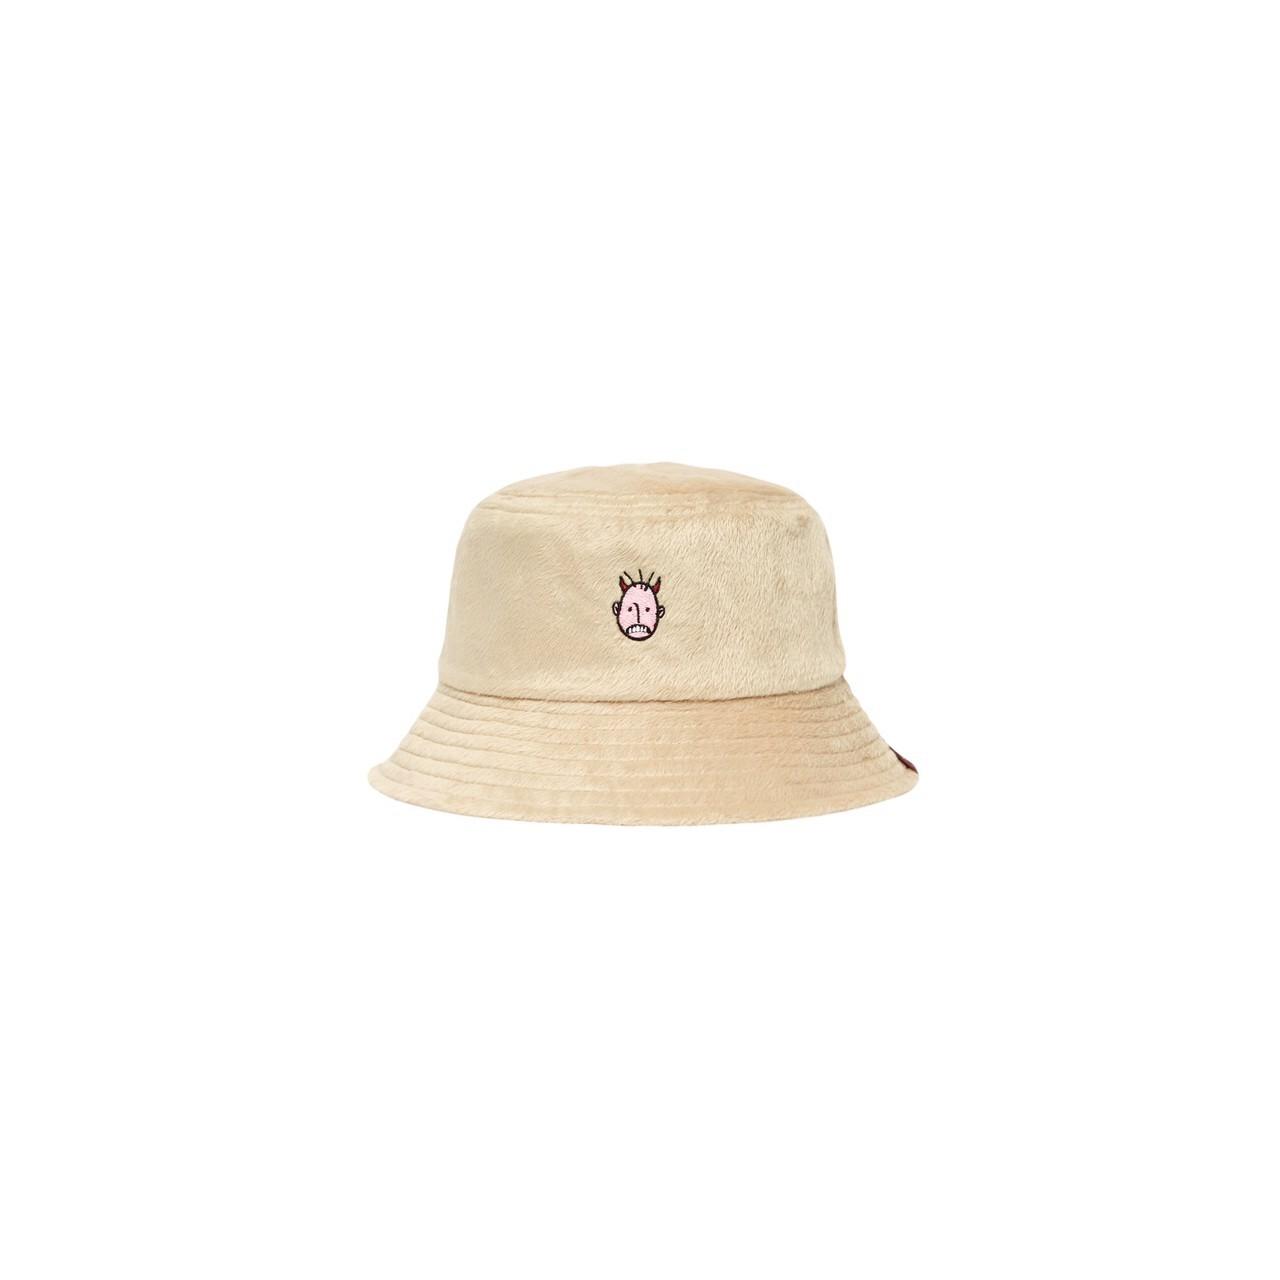 UXRY CLUB IMOTO CARAMEL BUCKET HAT BEIGE